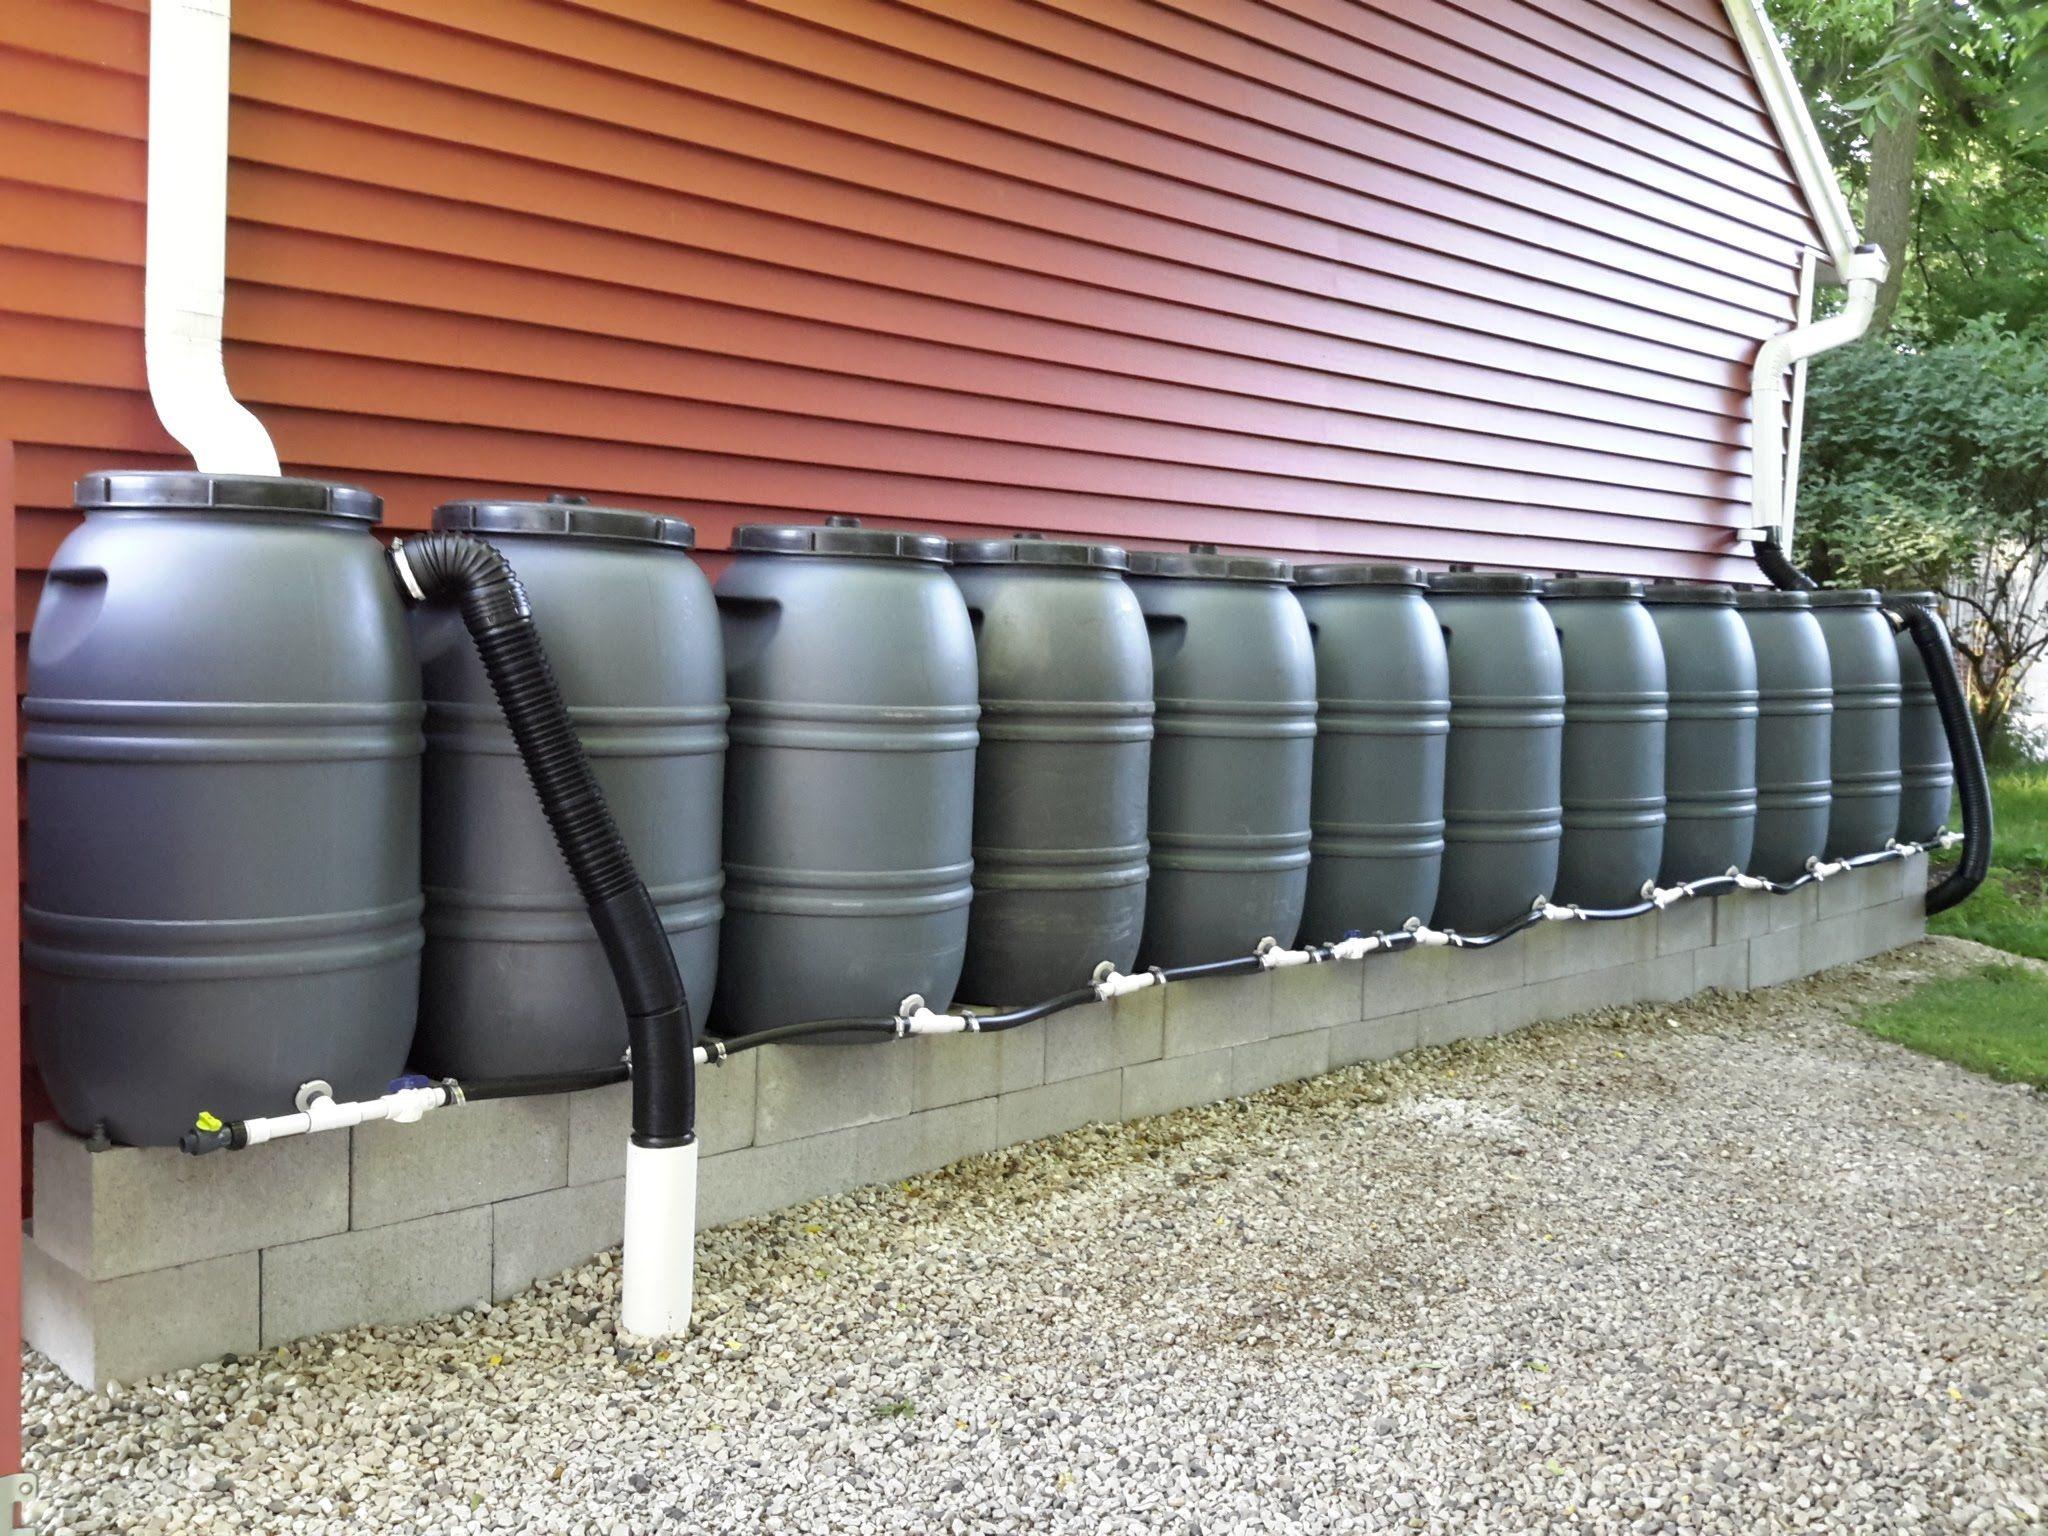 660 Gallon Rain Barrel Manifold System